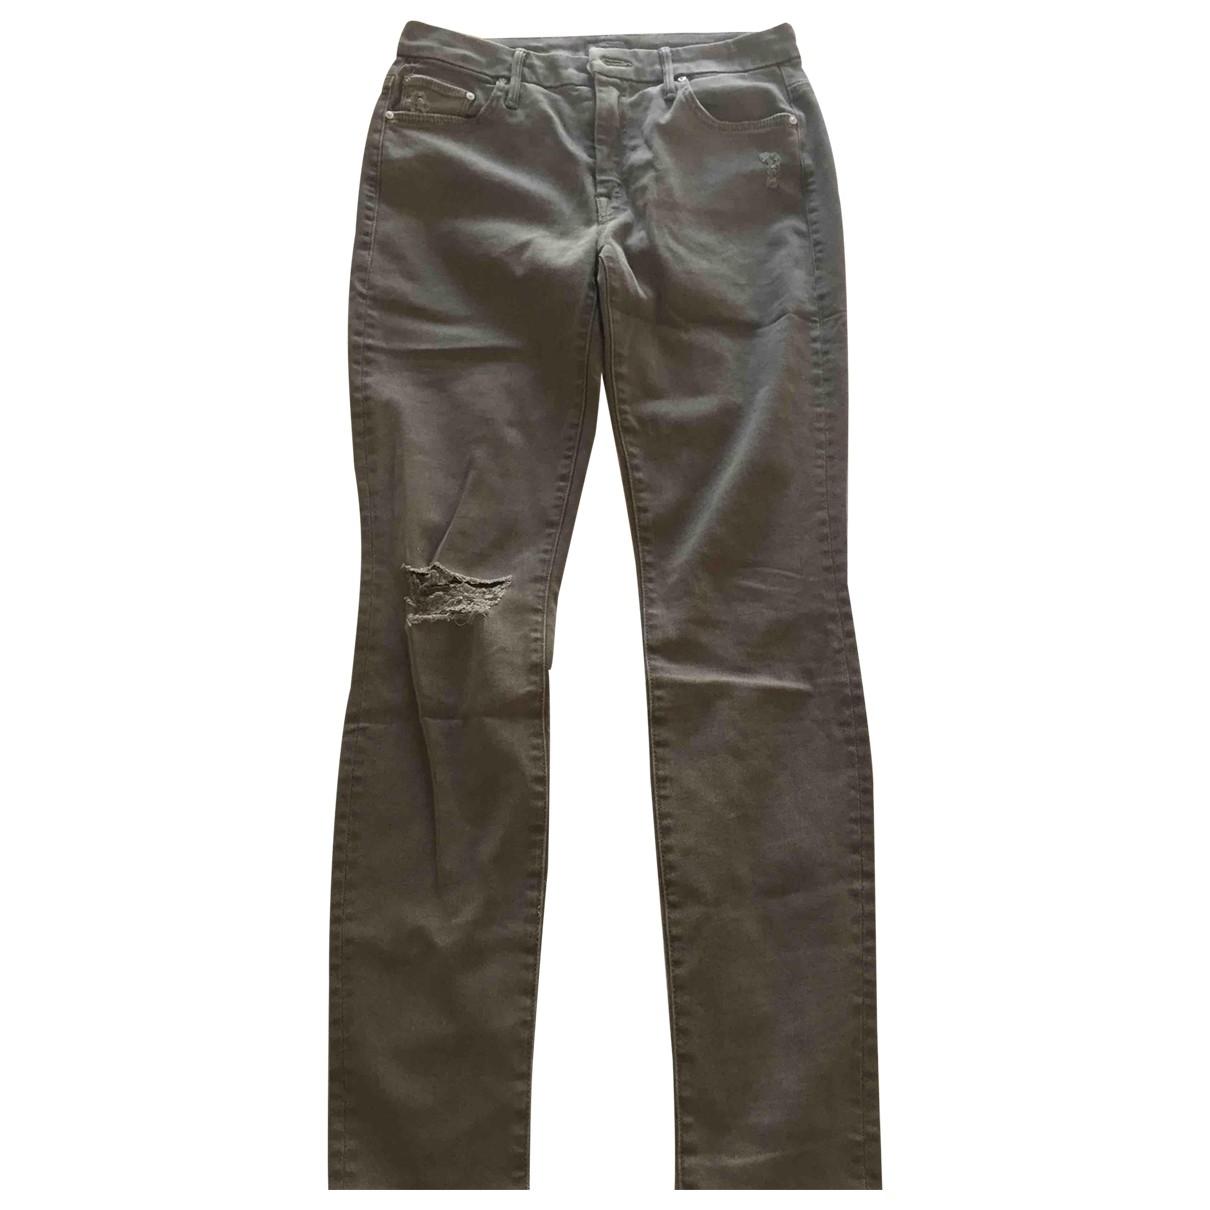 M\N Grey Denim - Jeans Trousers for Women S International